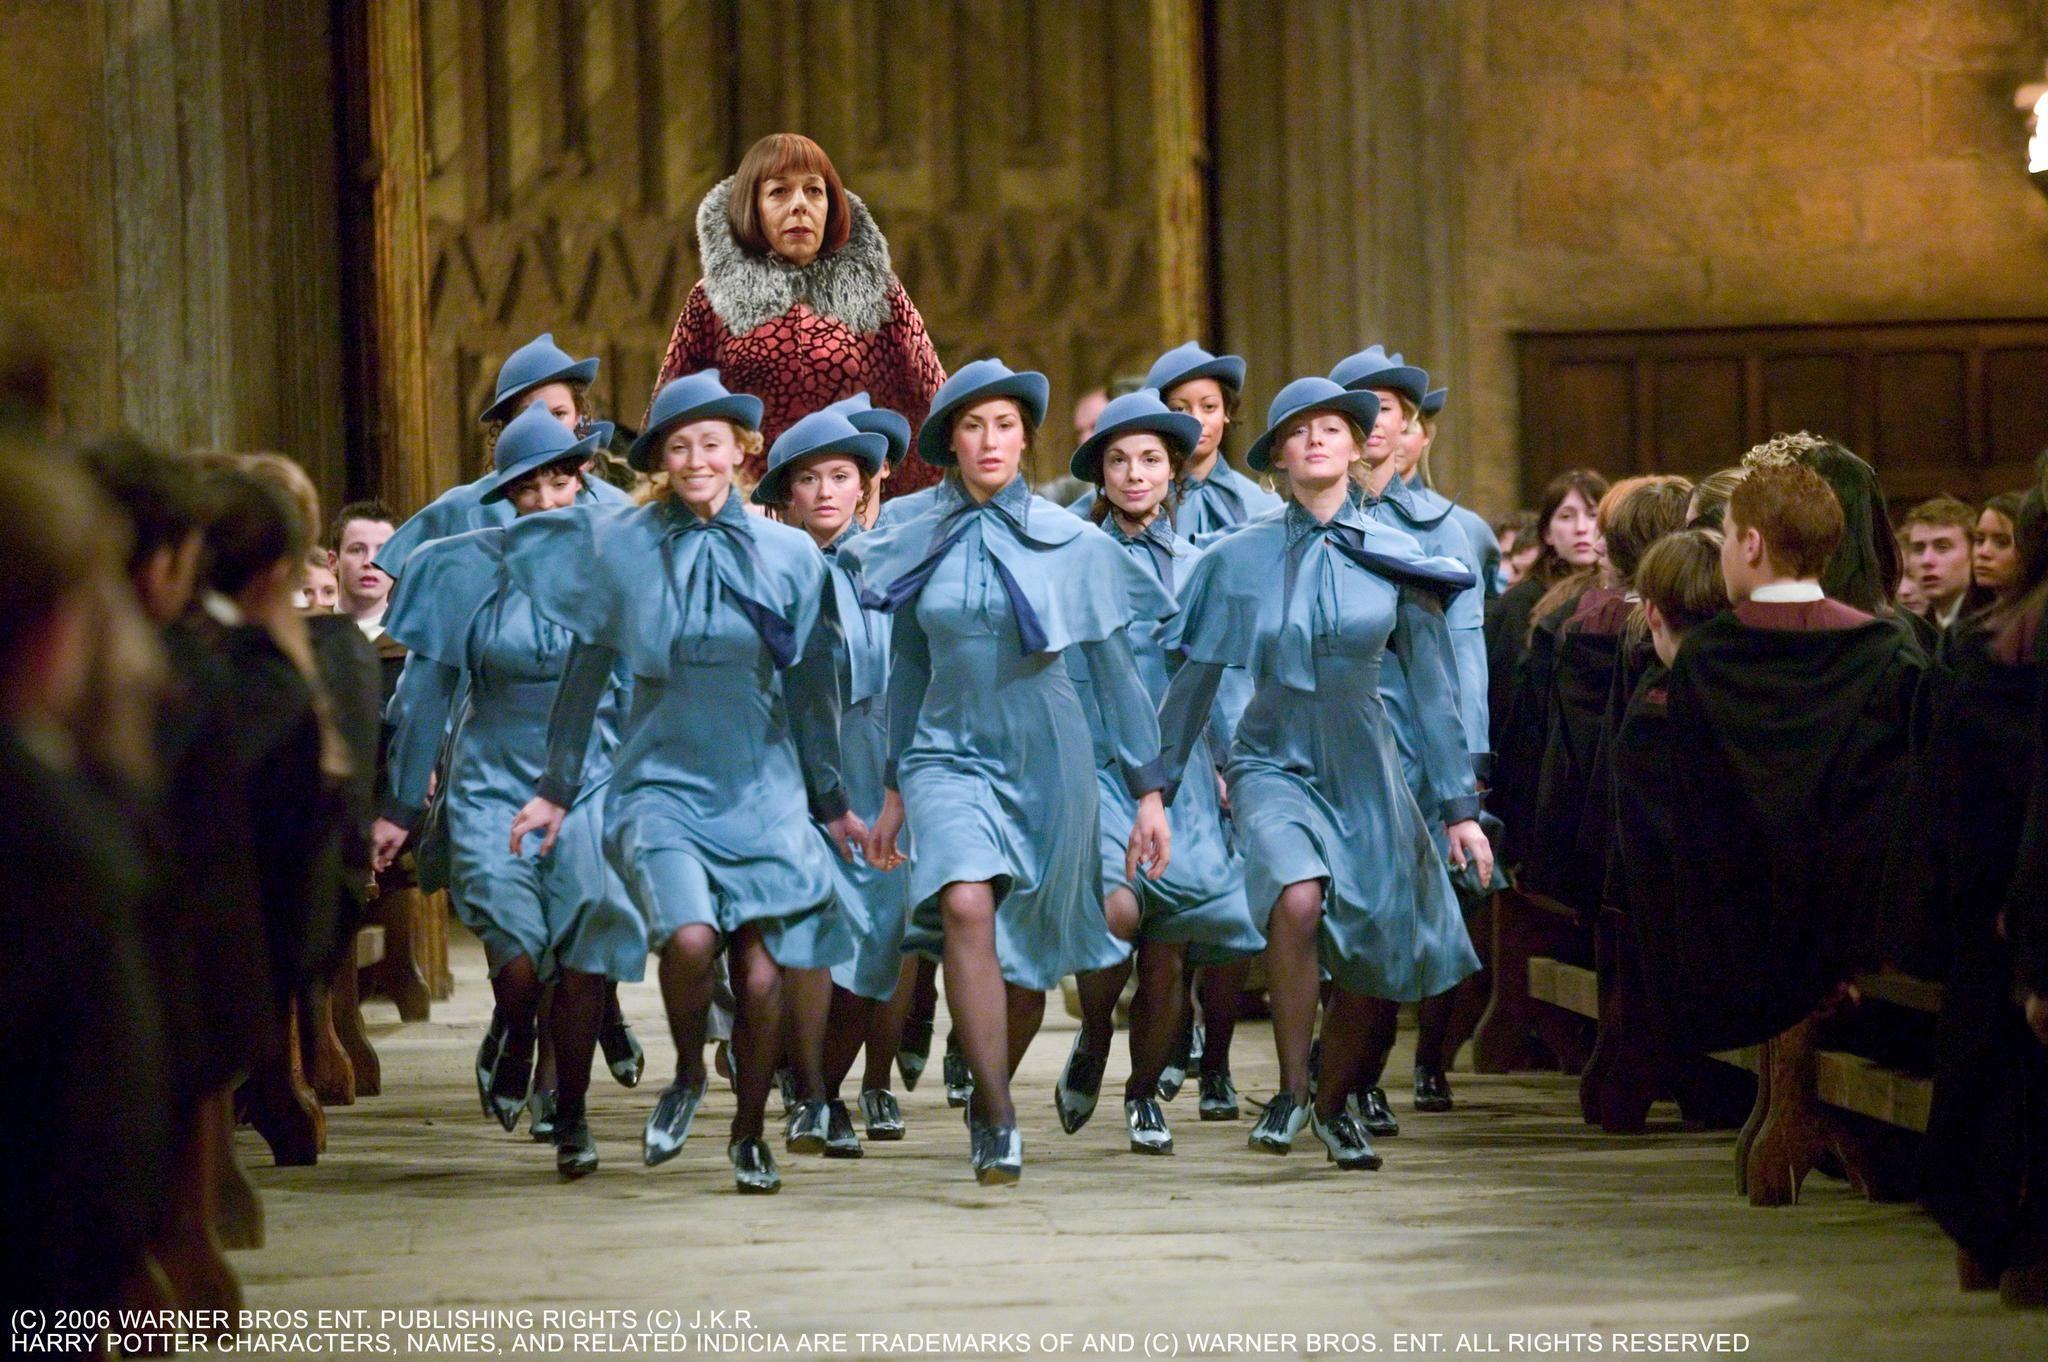 Pin Frances De La Tour In Harry Potter Och Den Flammande Bägaren ...